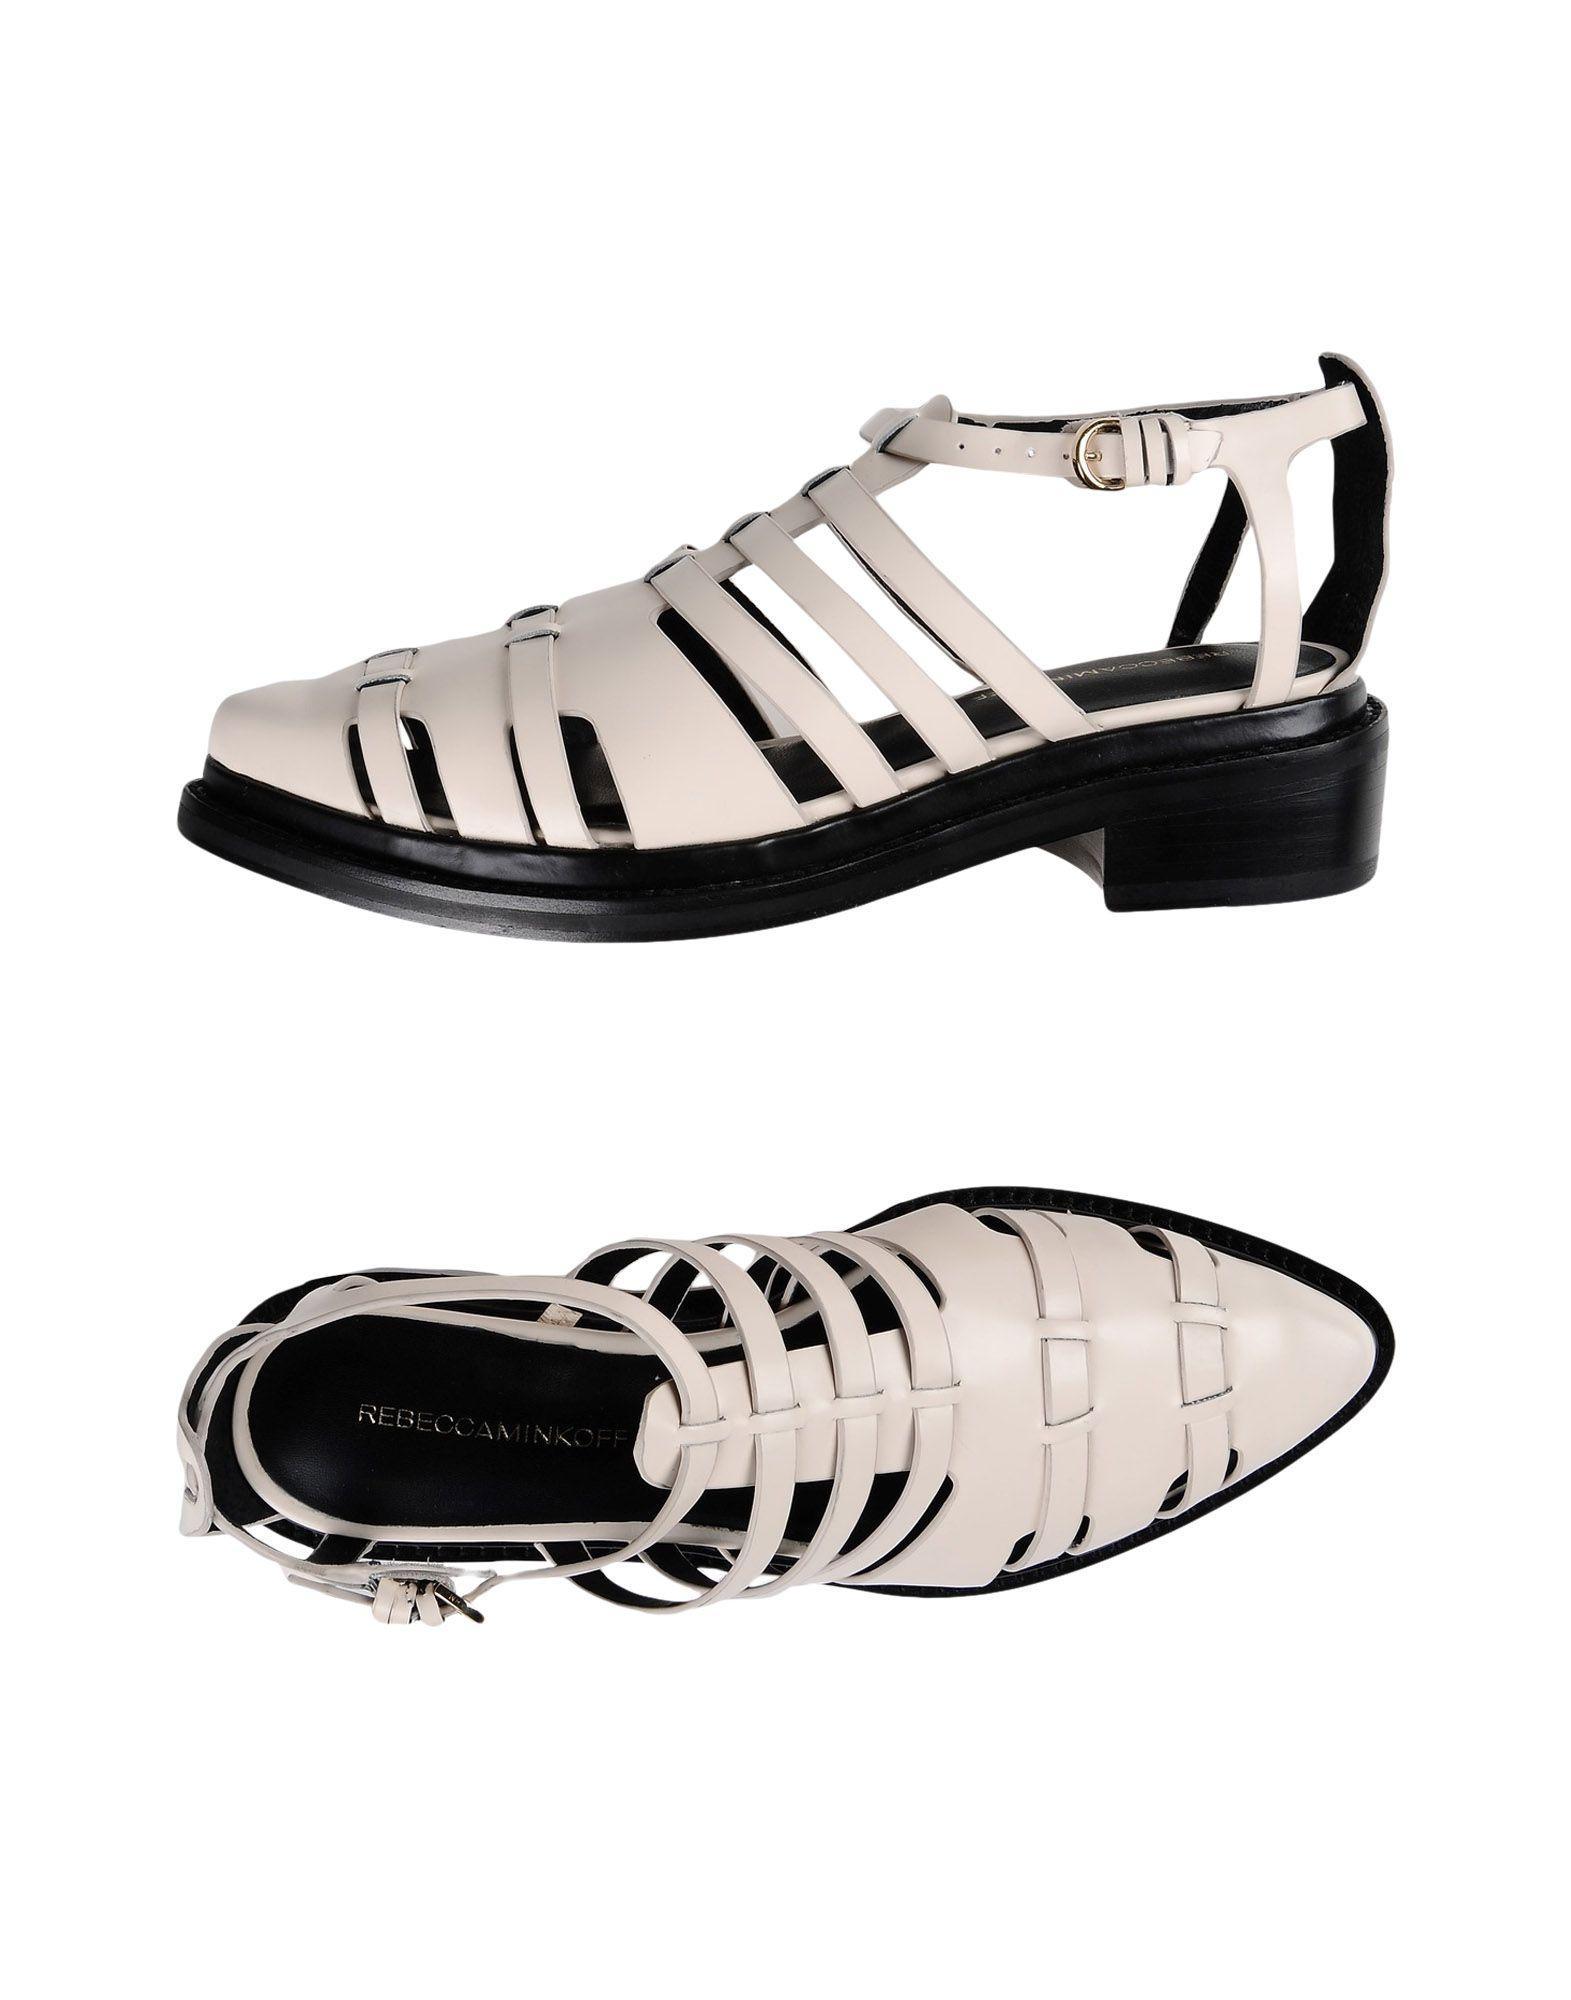 Rebecca Minkoff Sandals In Beige